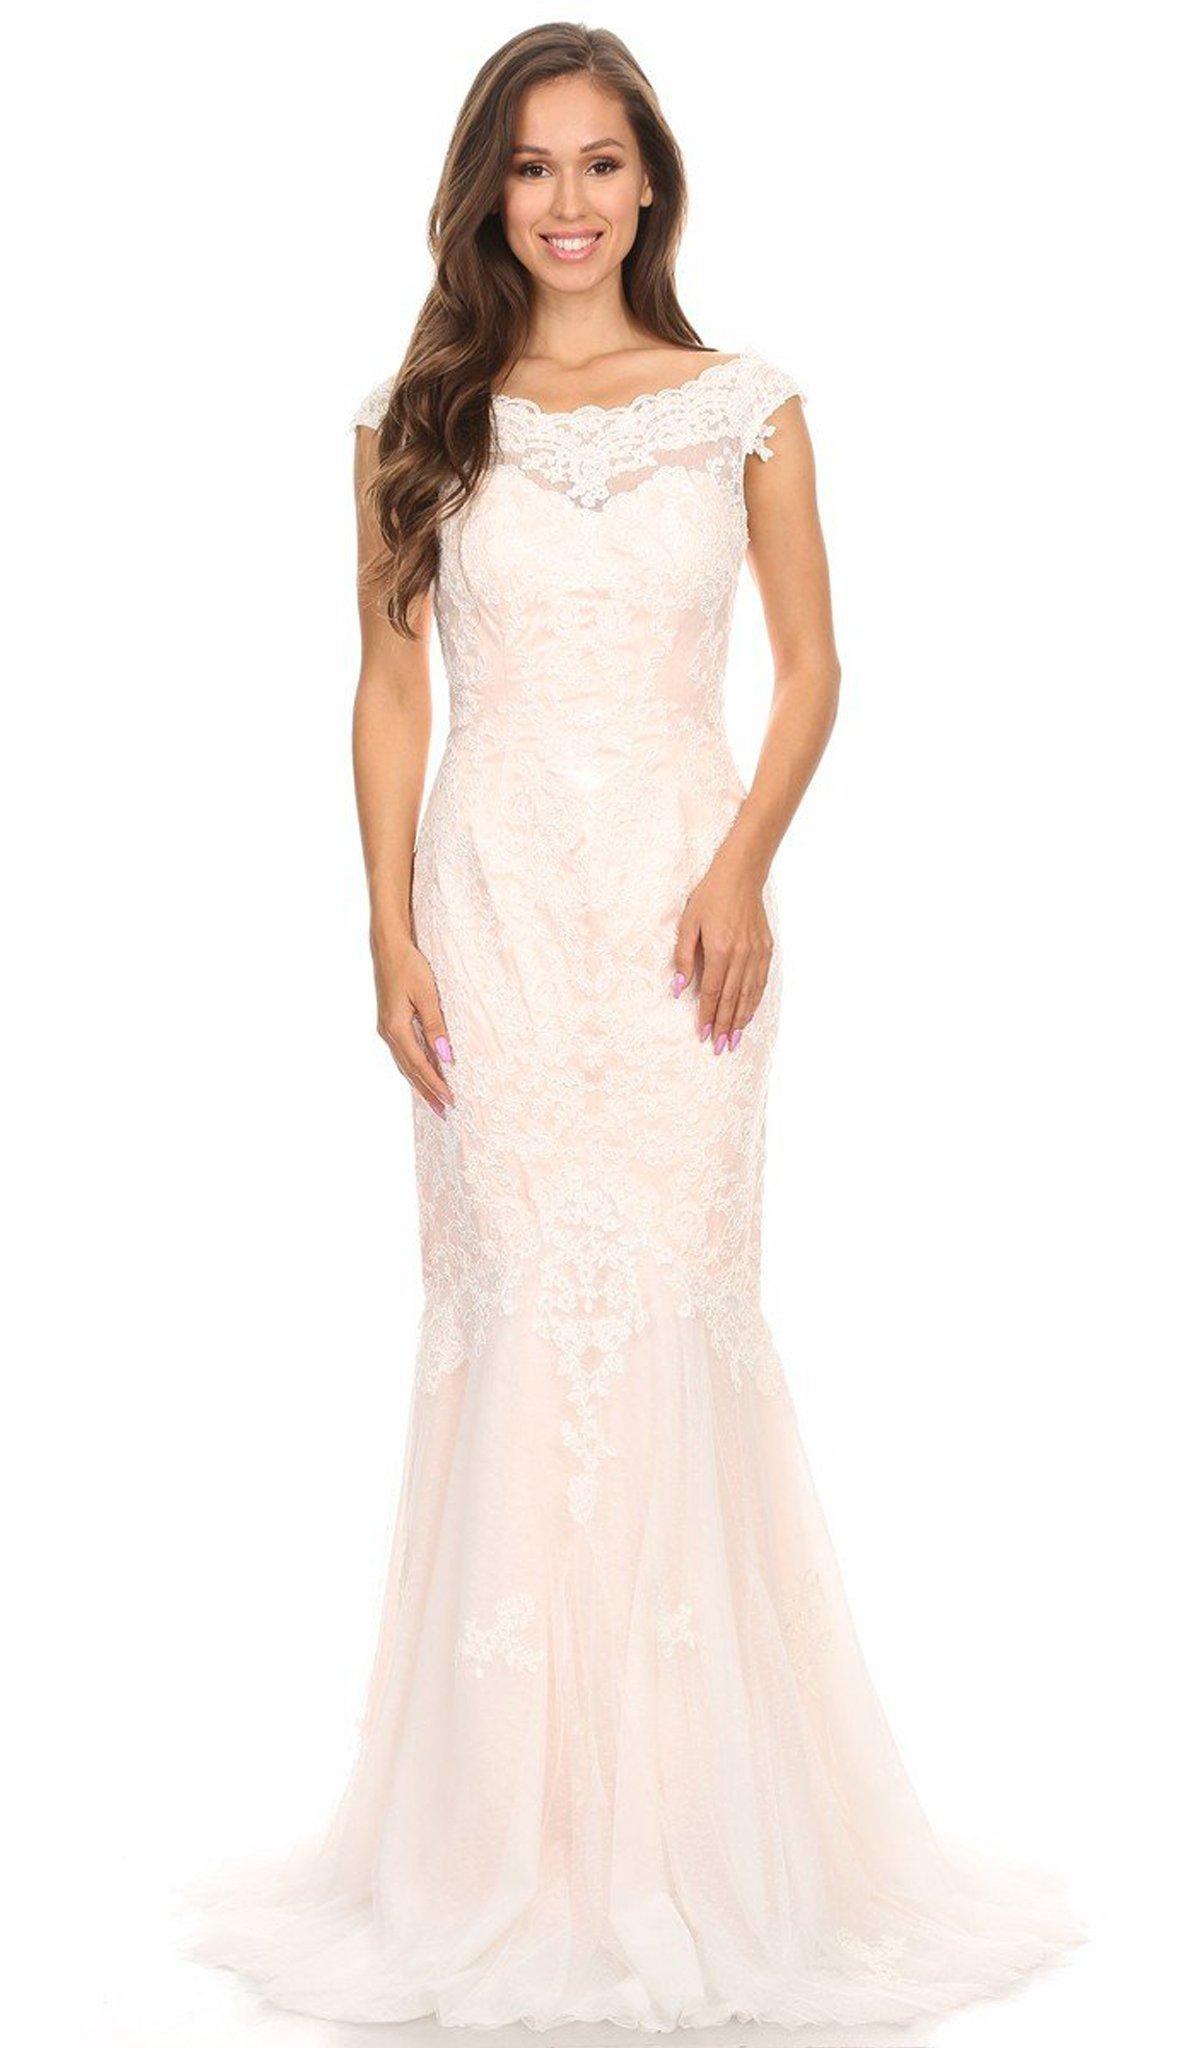 Eureka Fashion - 3510 Lace Bateau Long Mermaid Dress